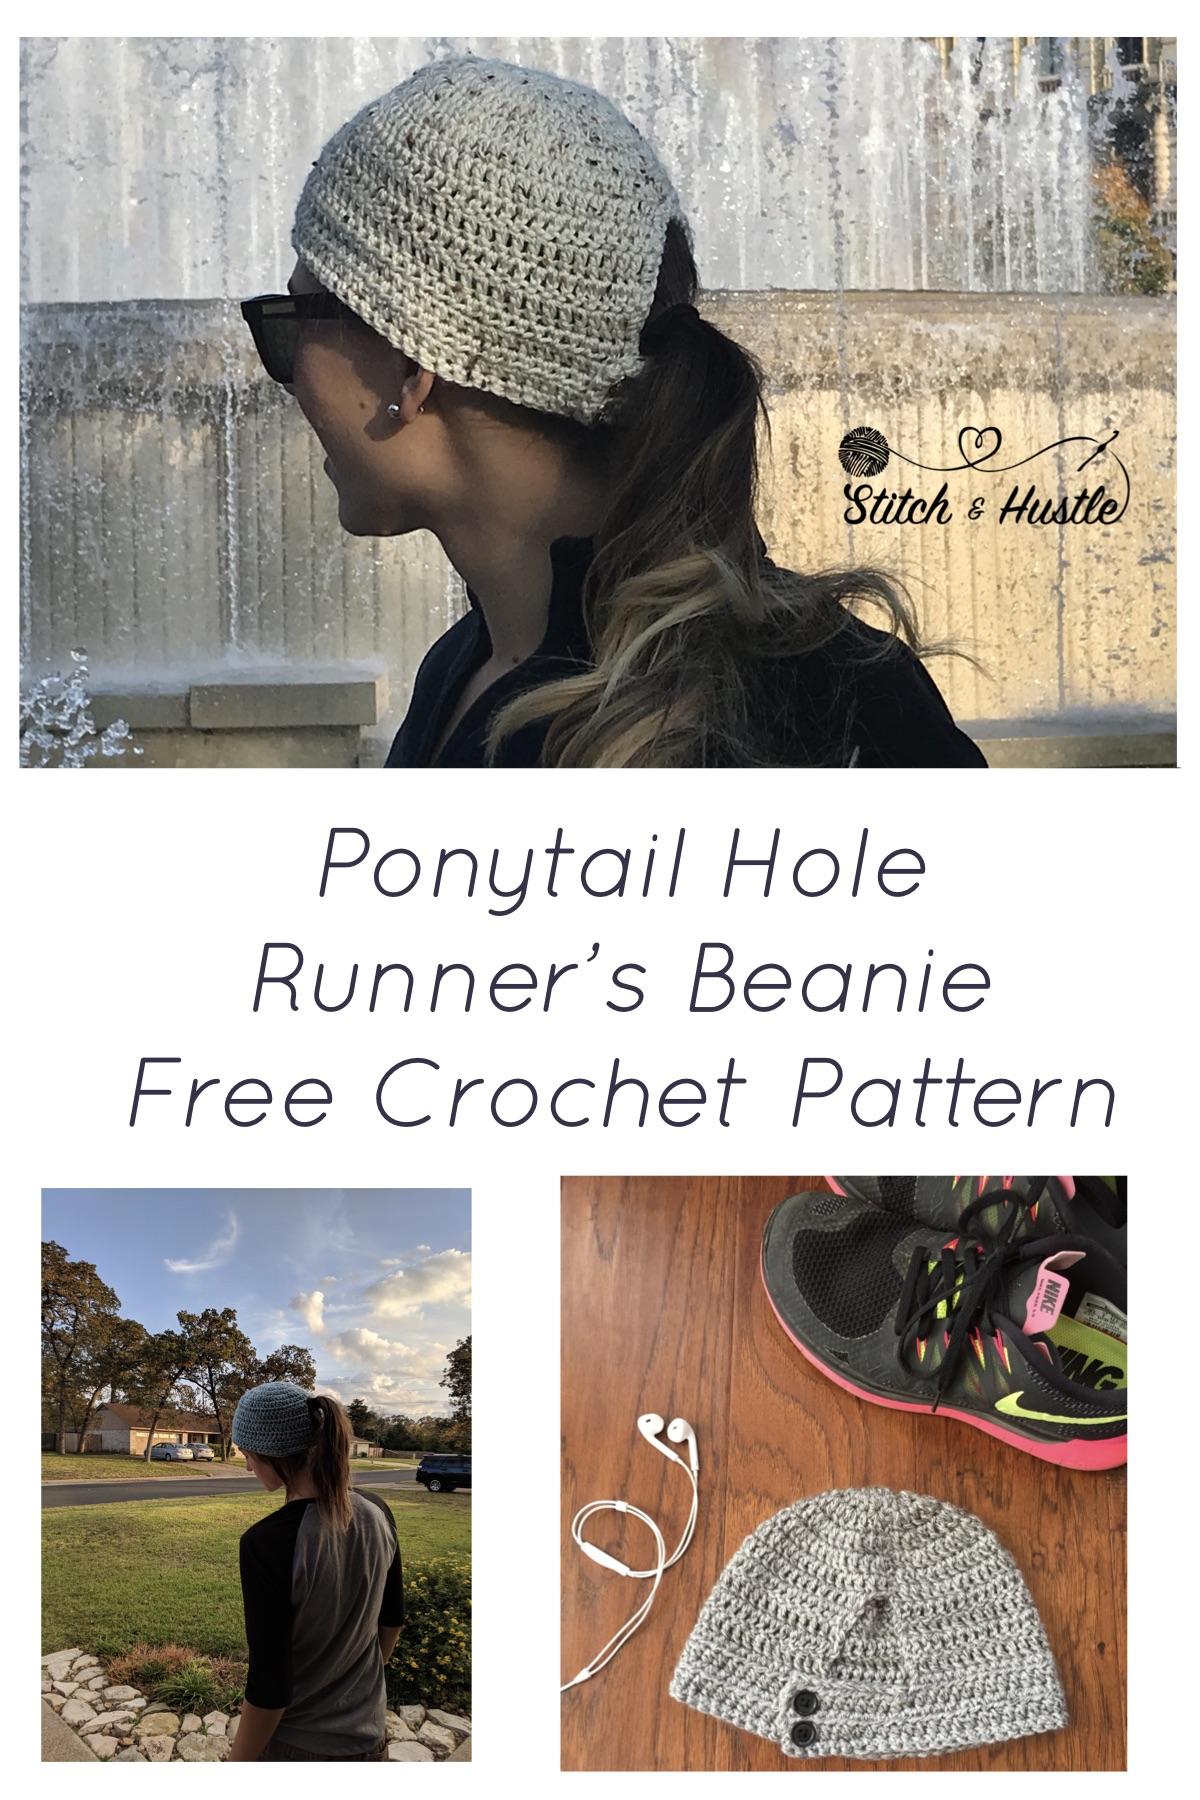 776115d7a7d ... ponytail beanie e2f59 13910 reduced the norwalk runners crochet beanie  free pattern u2014 stitch hustle bf6e8 51d01 ...